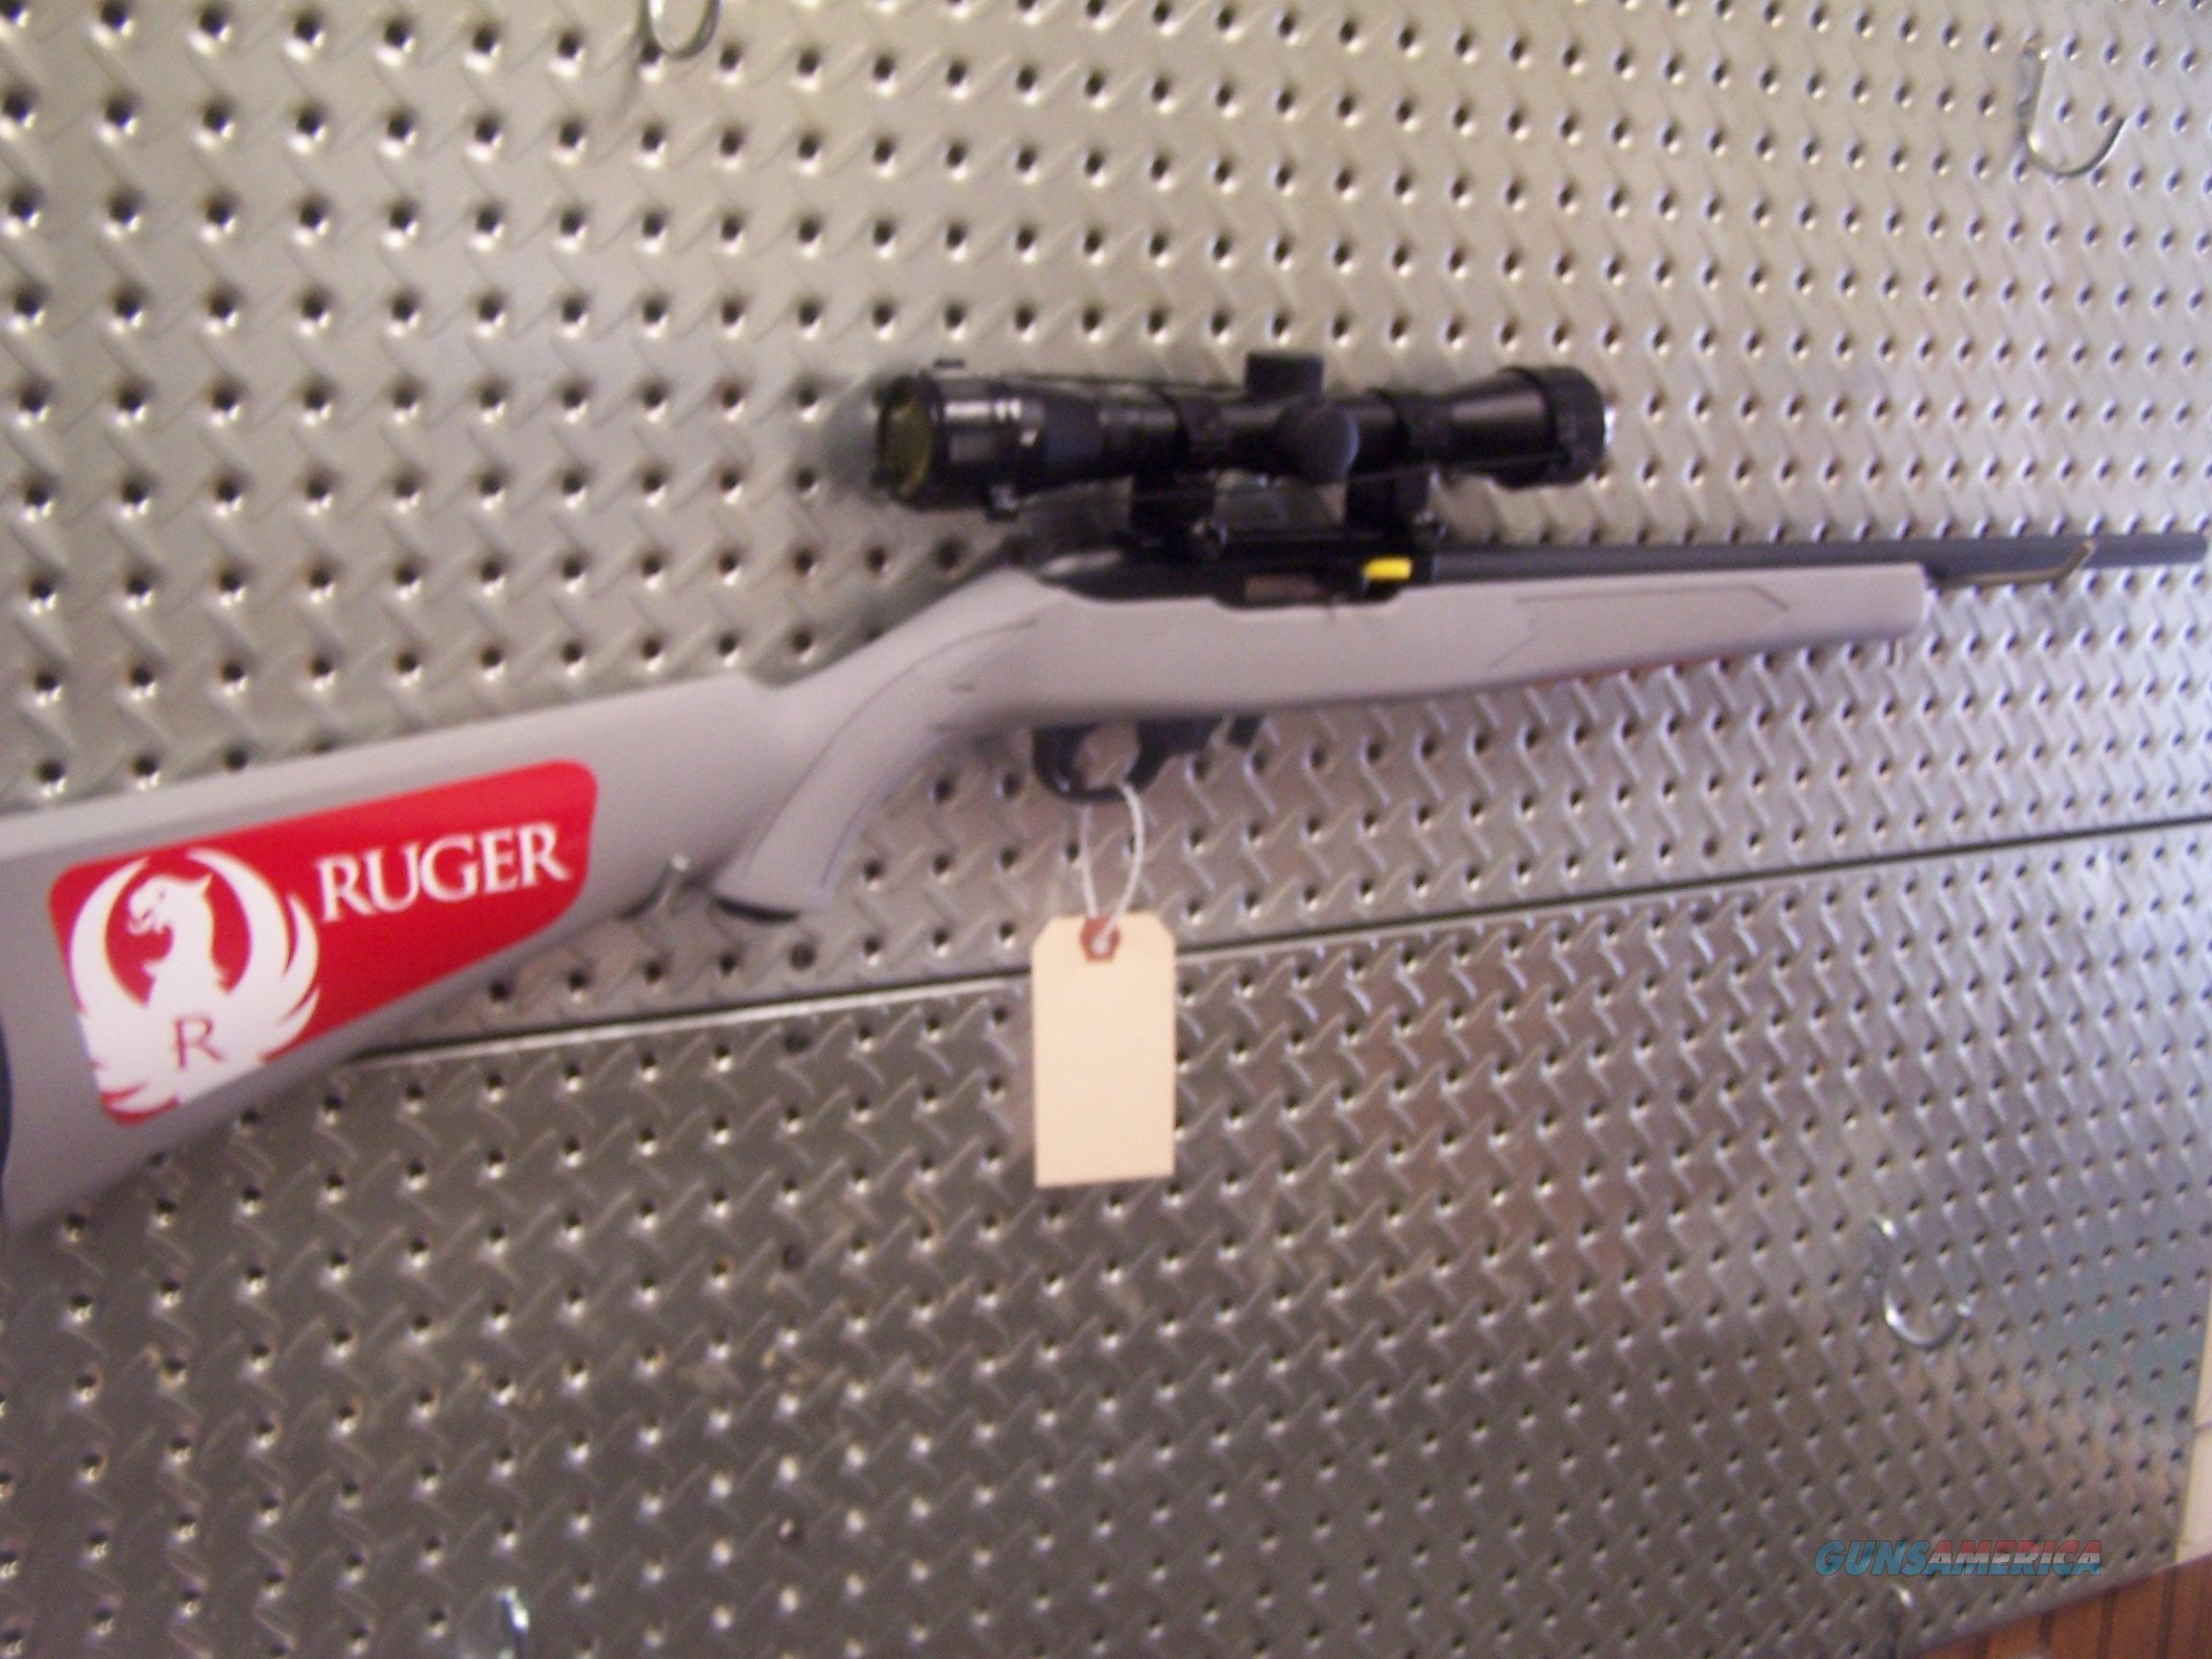 "Ruger 10/22 Carbine .22 LR Semi-Auto 10rd 18.5"" Rifle, Gray Stock w/Redfield 4X36 Scope. NIB  Guns > Rifles > Ruger Rifles > 10-22"